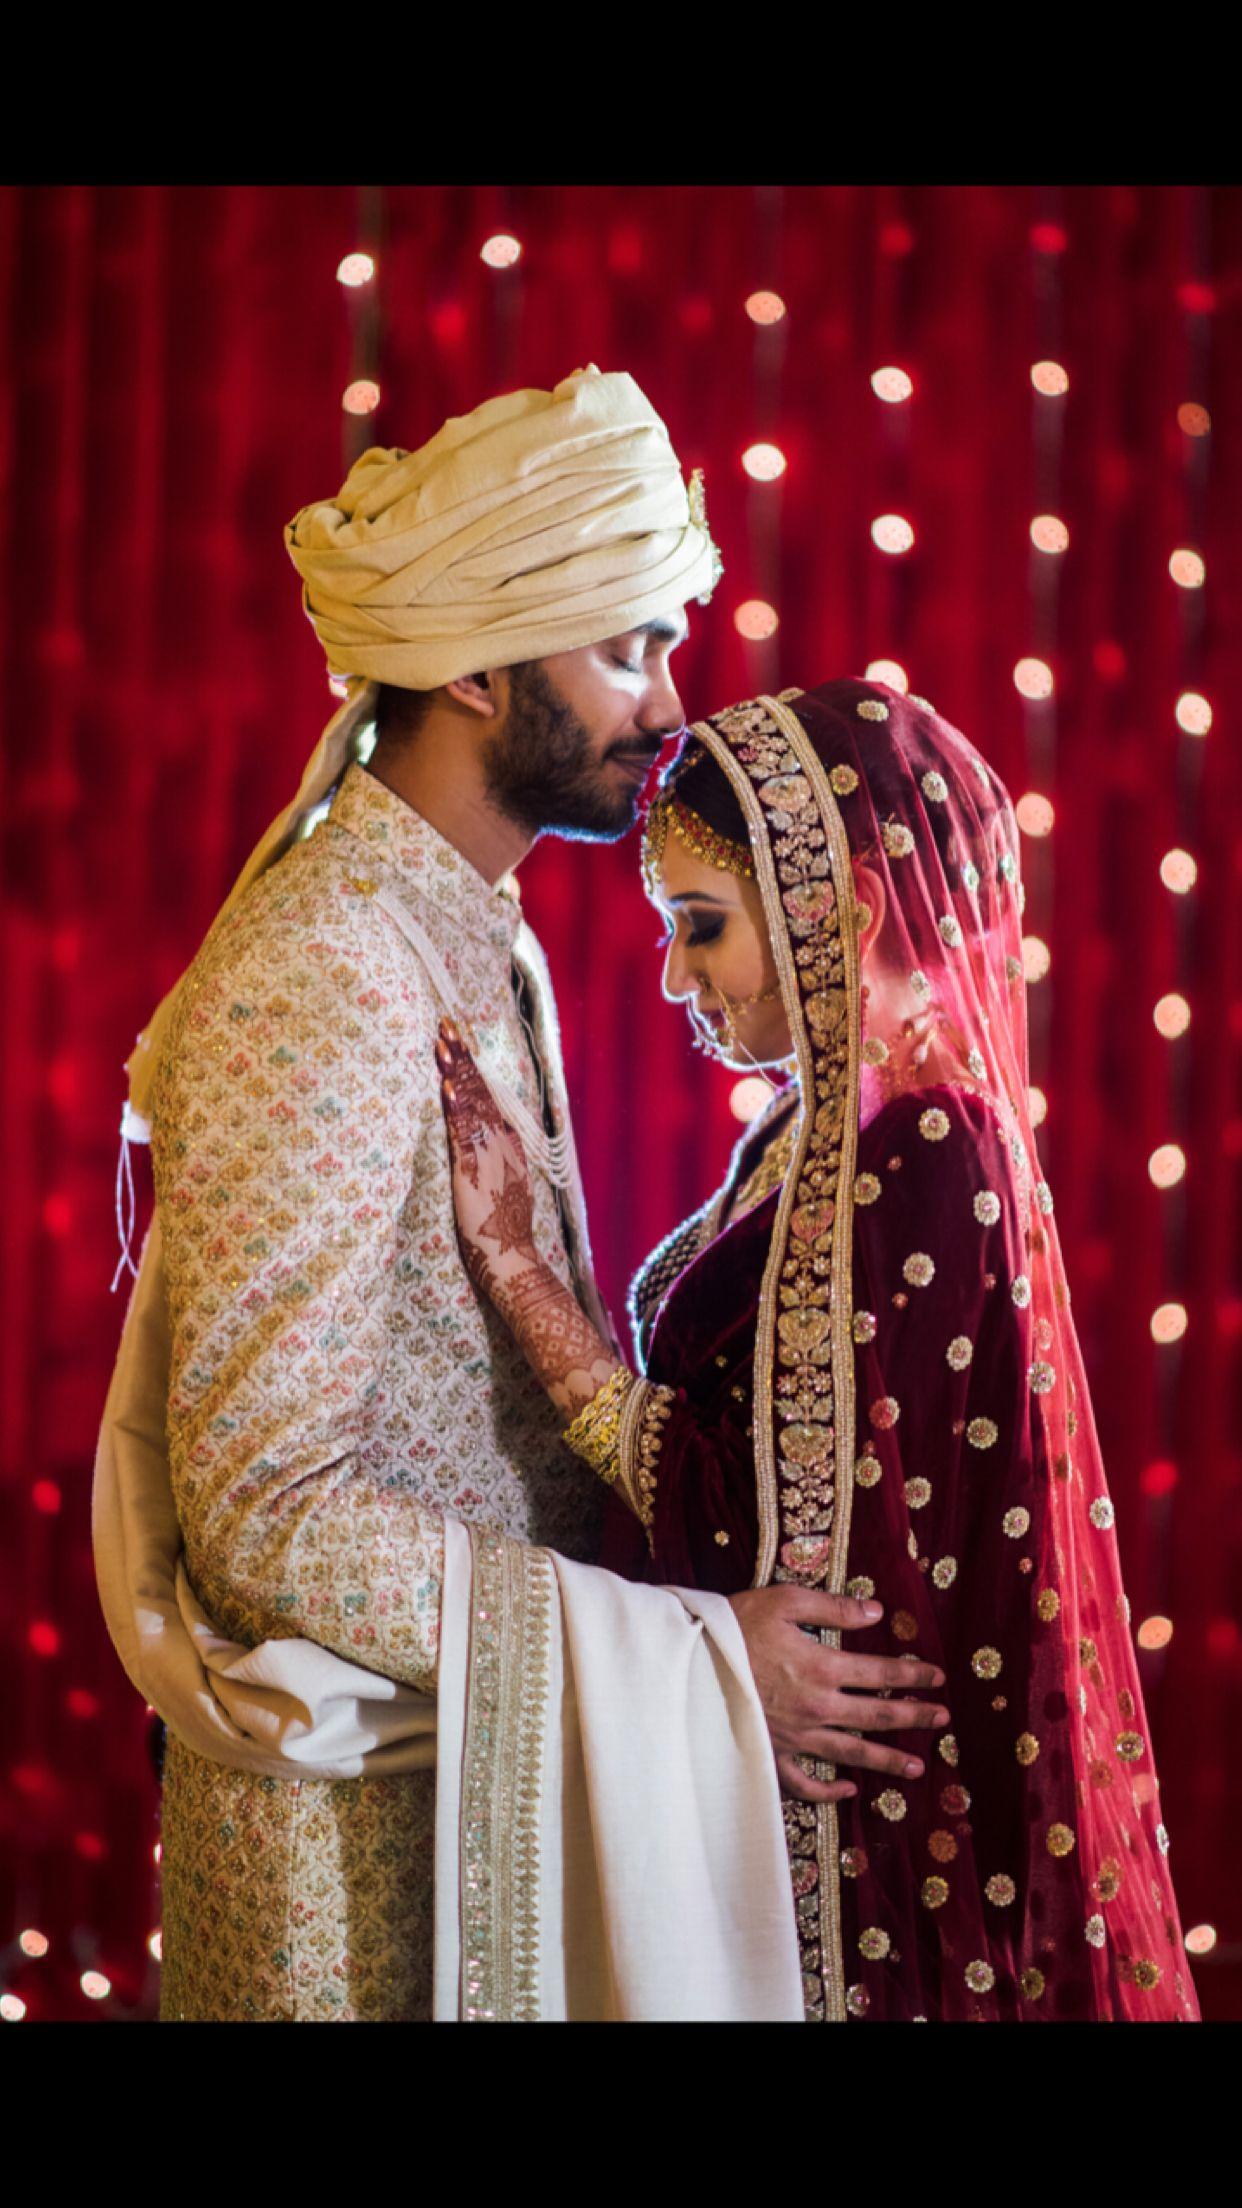 Sabyasachi Indian Wedding Photography Poses Indian Wedding Photography Indian Wedding Photography Couples